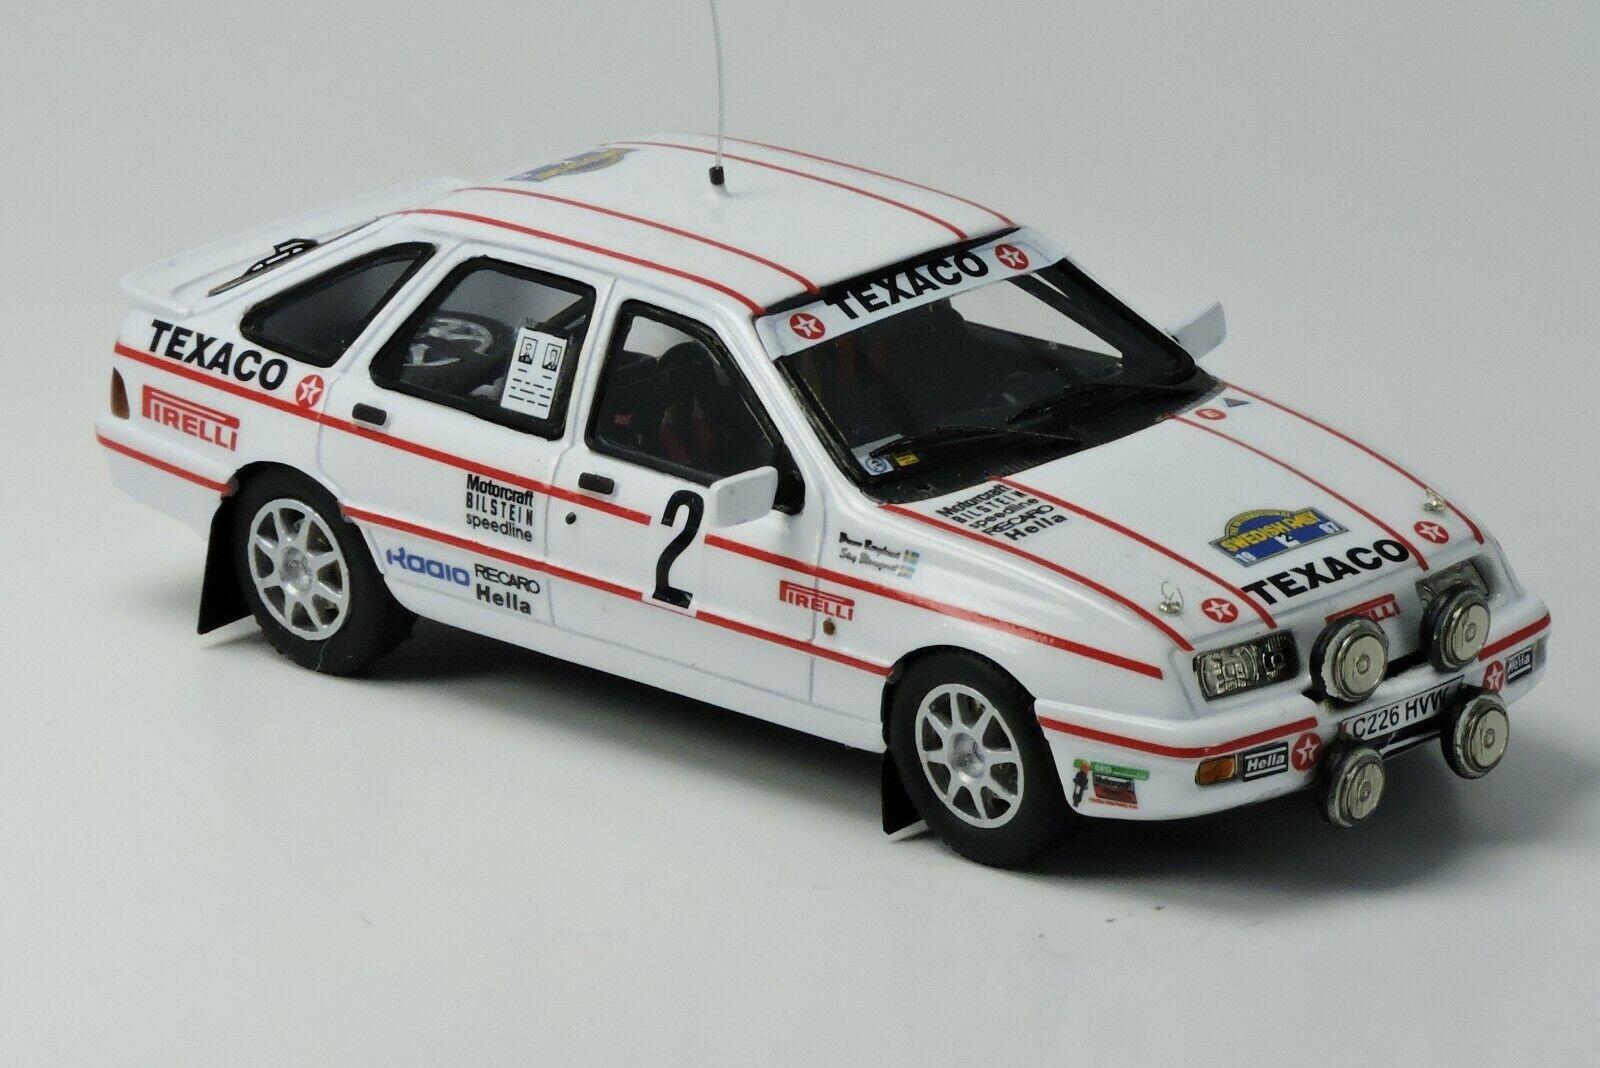 Kit Ford Sierra Xri 4X4 Rally Svezia 1987 - Arena Modelskit 1 43